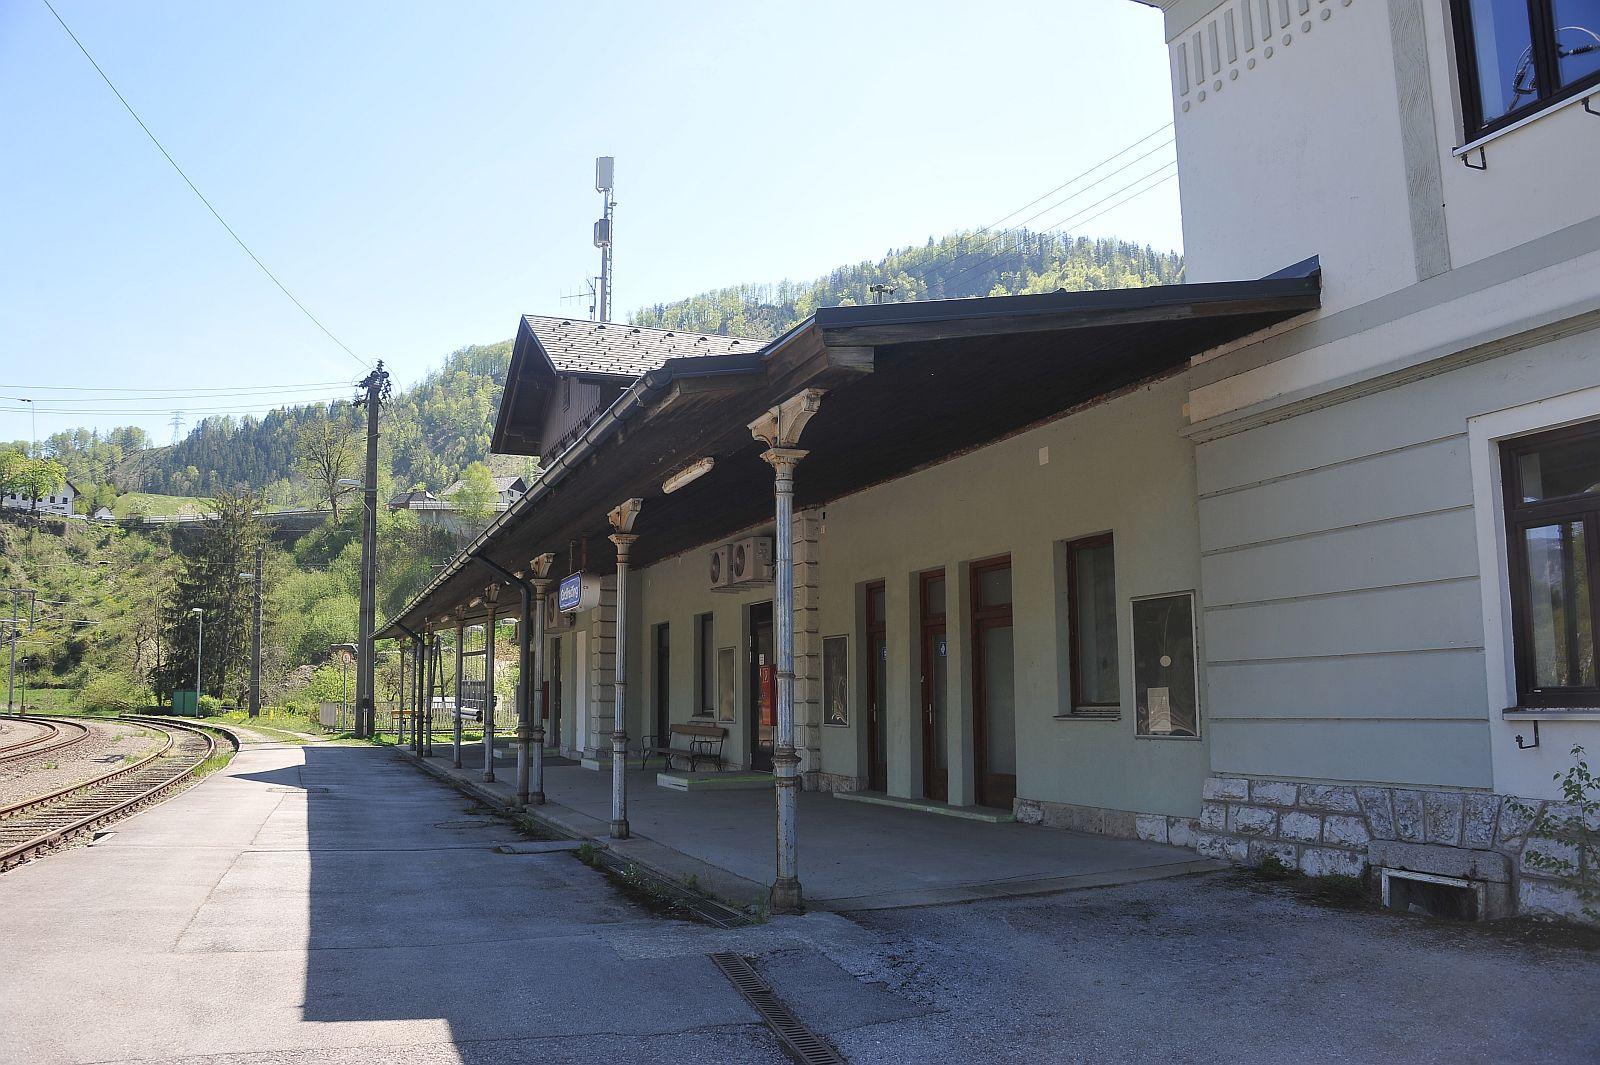 Bilder vom Bahnhof Großreifling